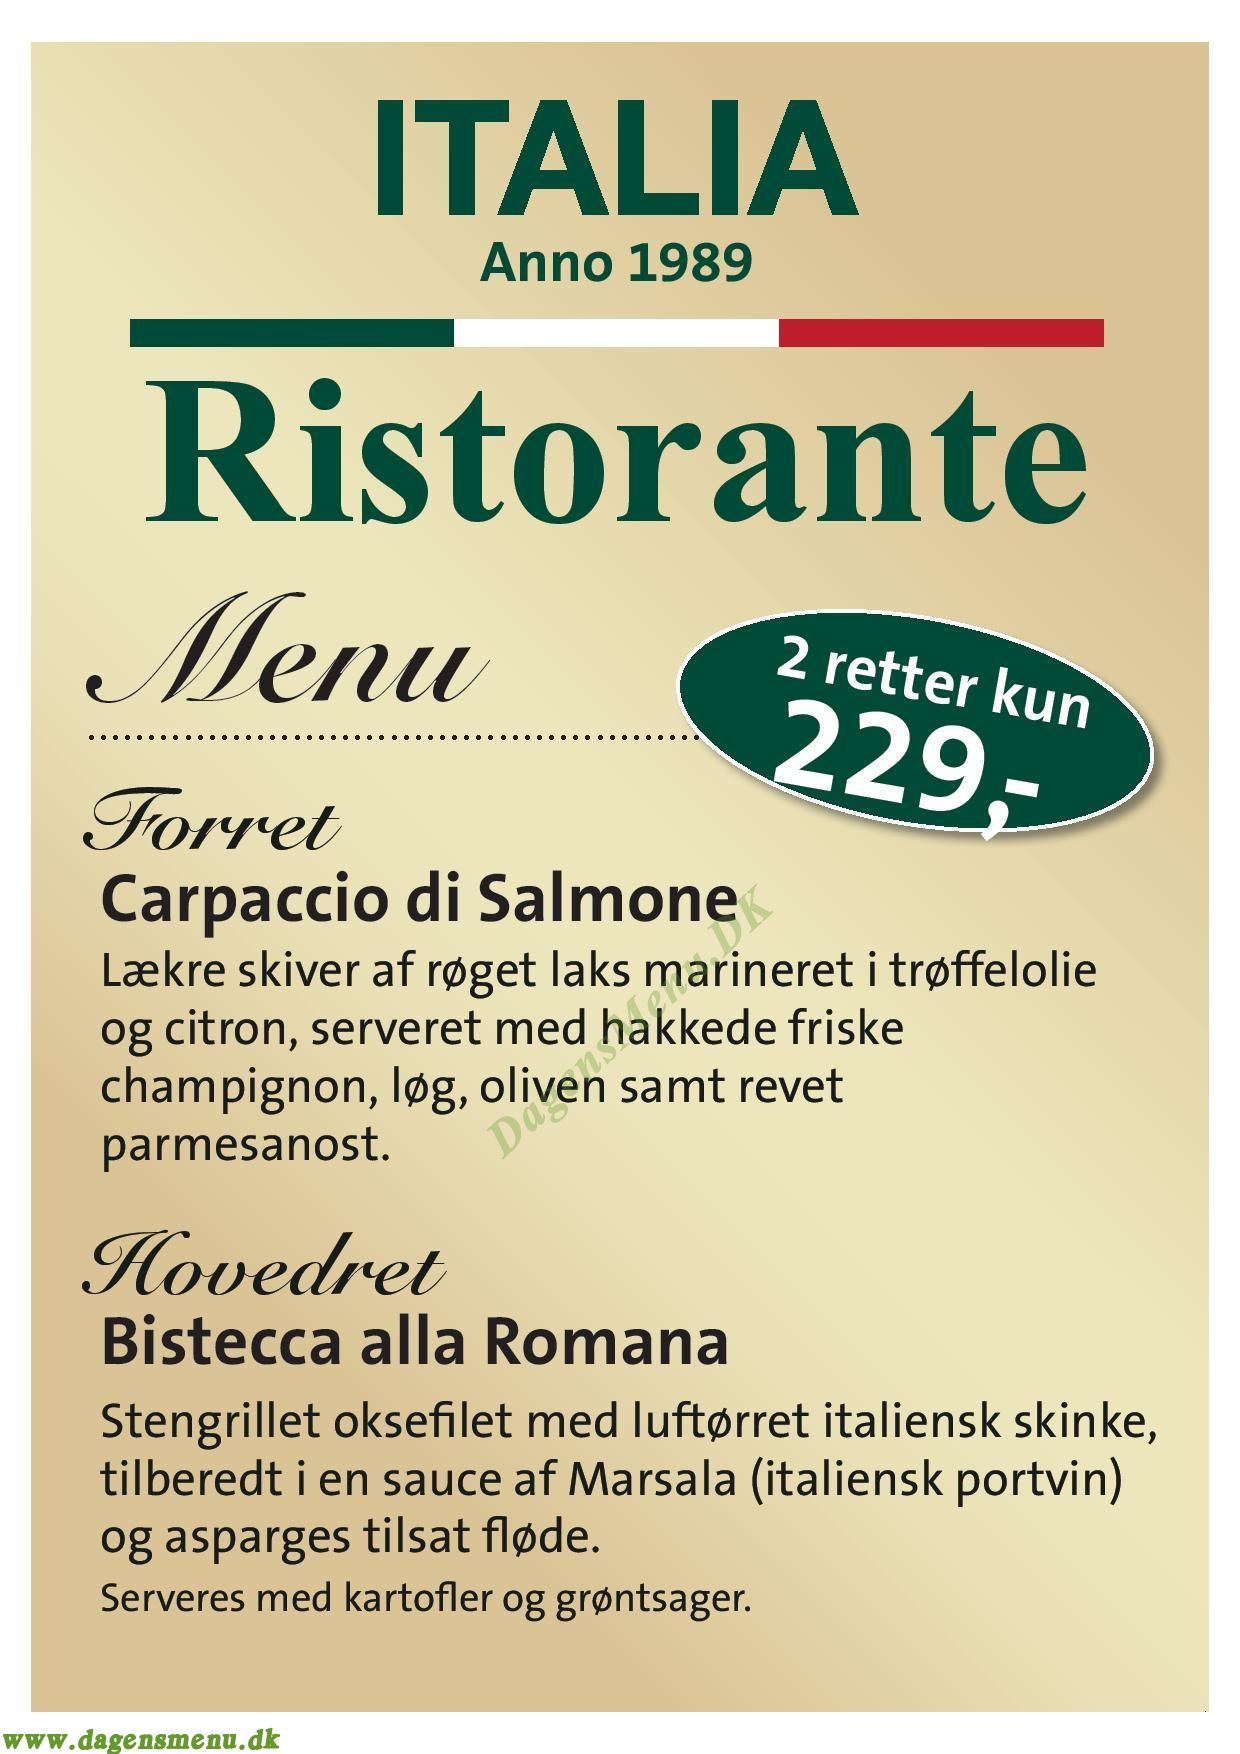 Ristorante Italia - Menukort